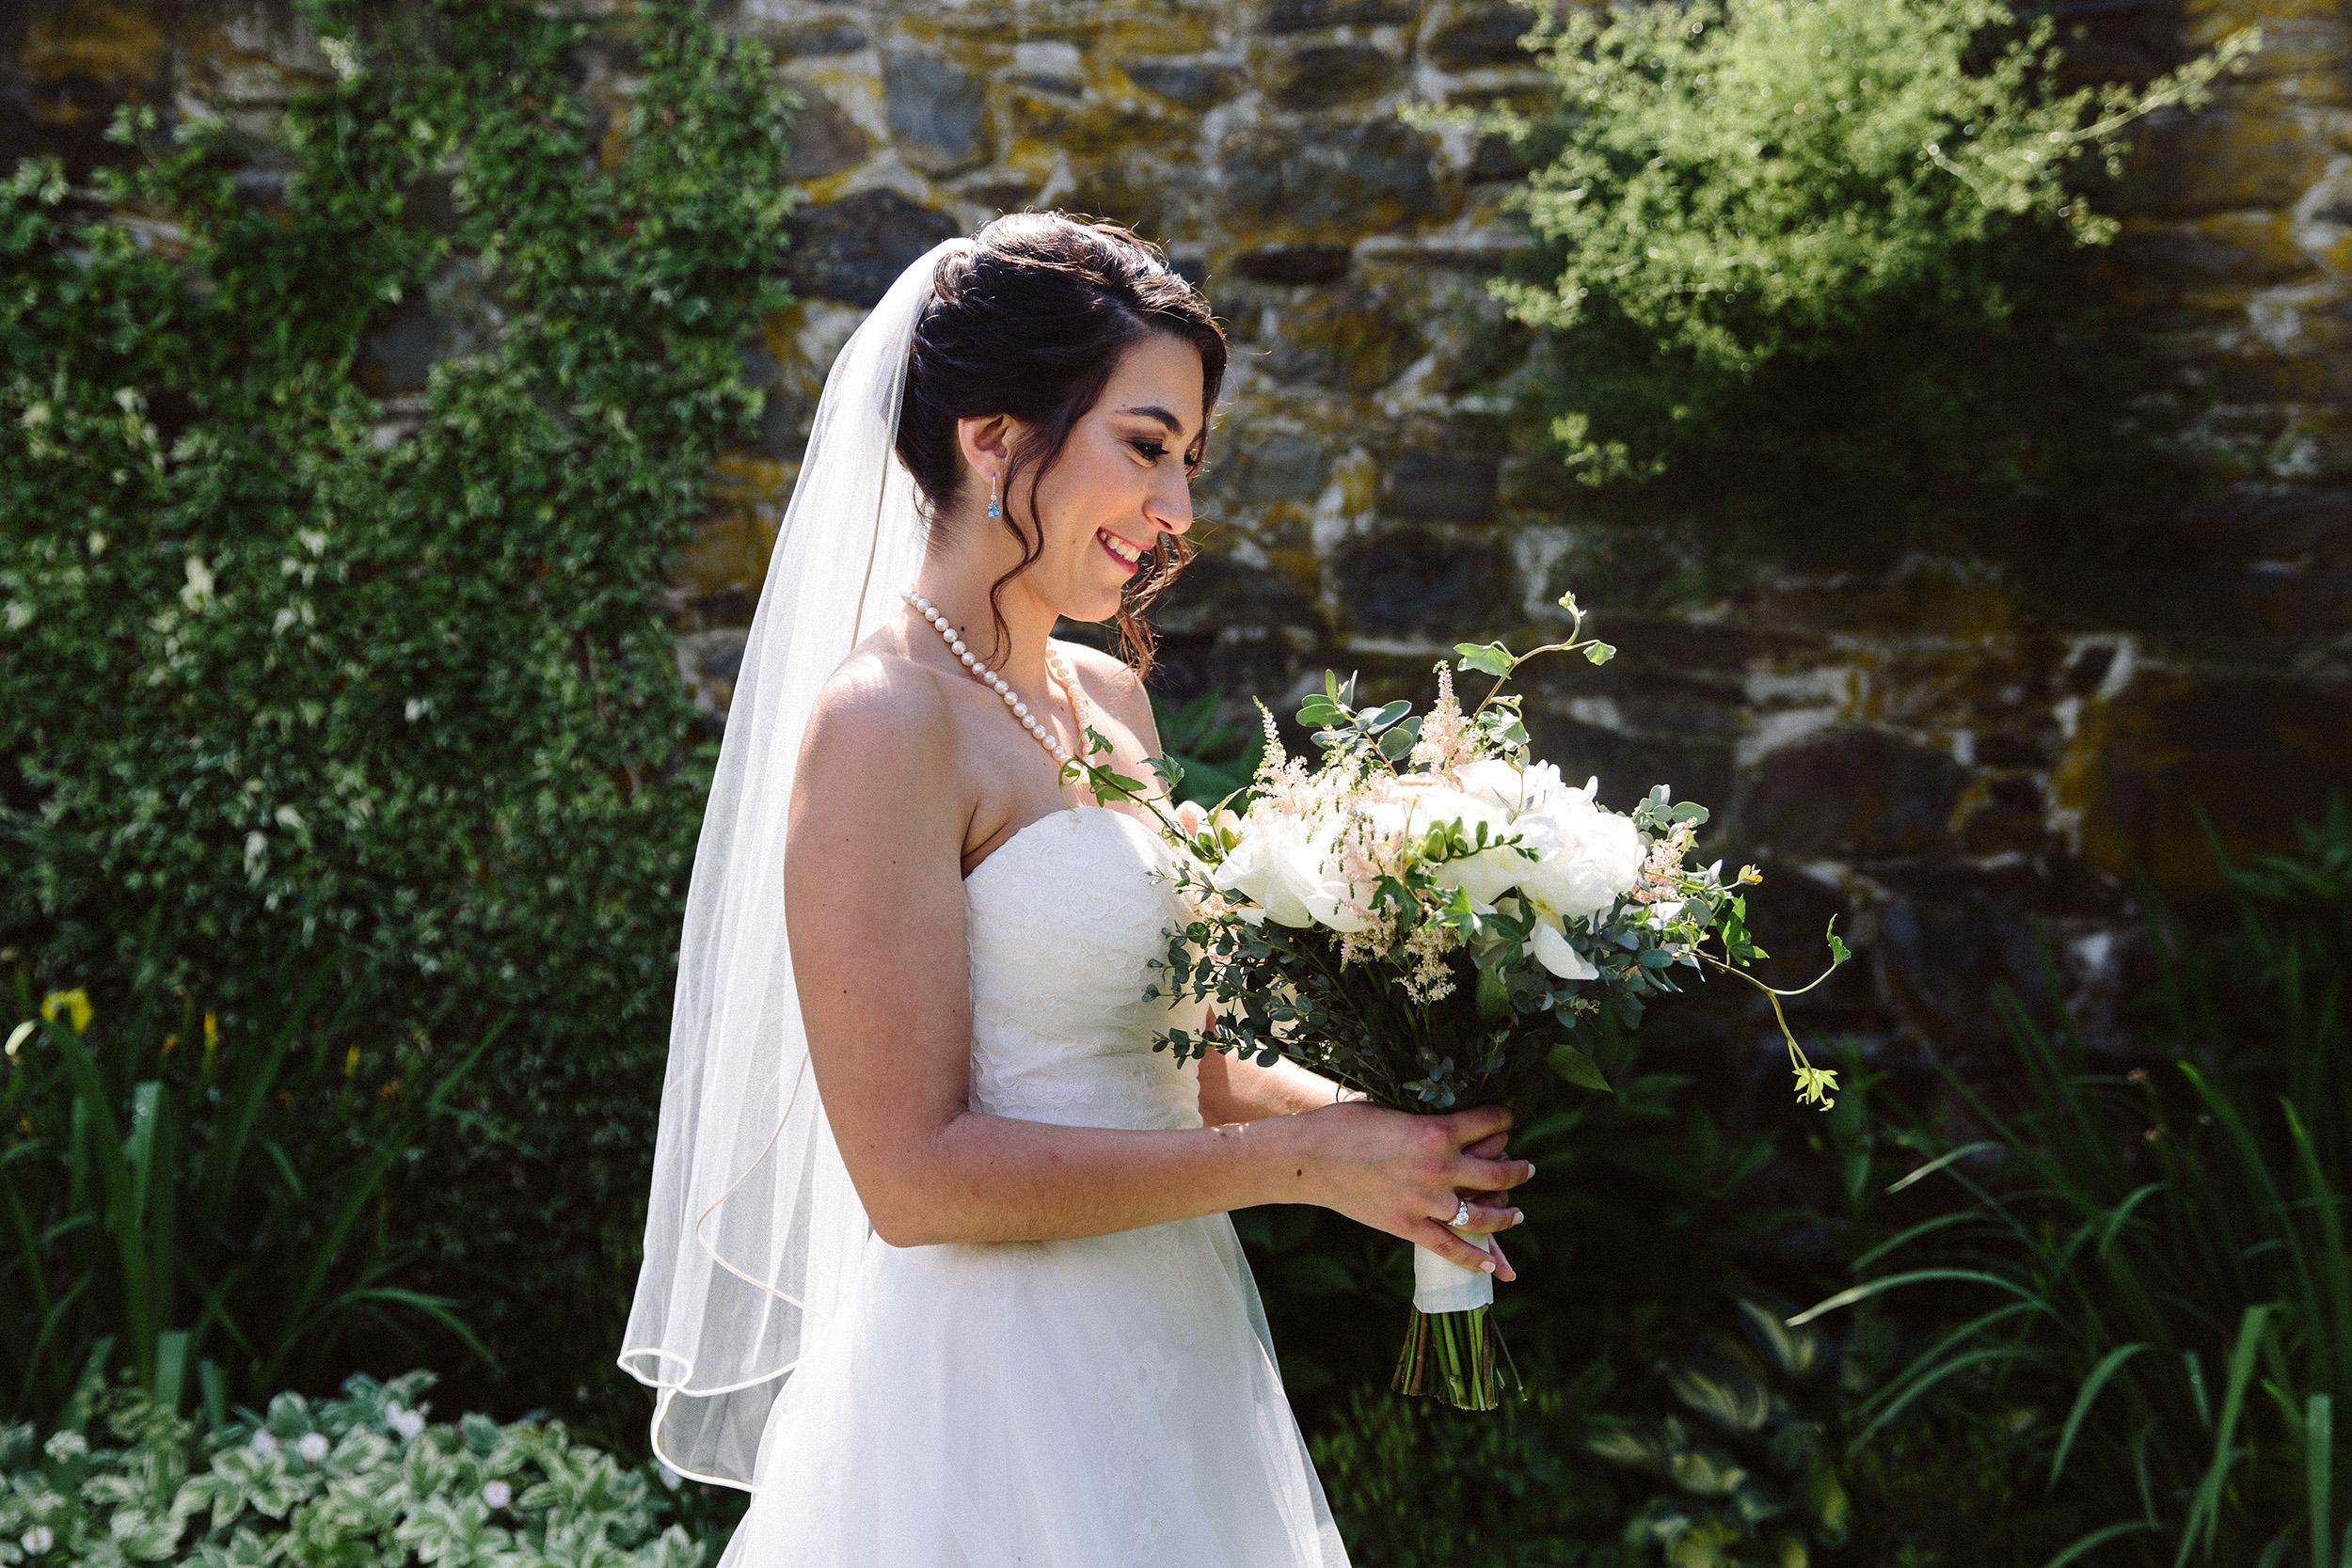 KarliCadel-Wedding-RachelJohn-1106.jpg